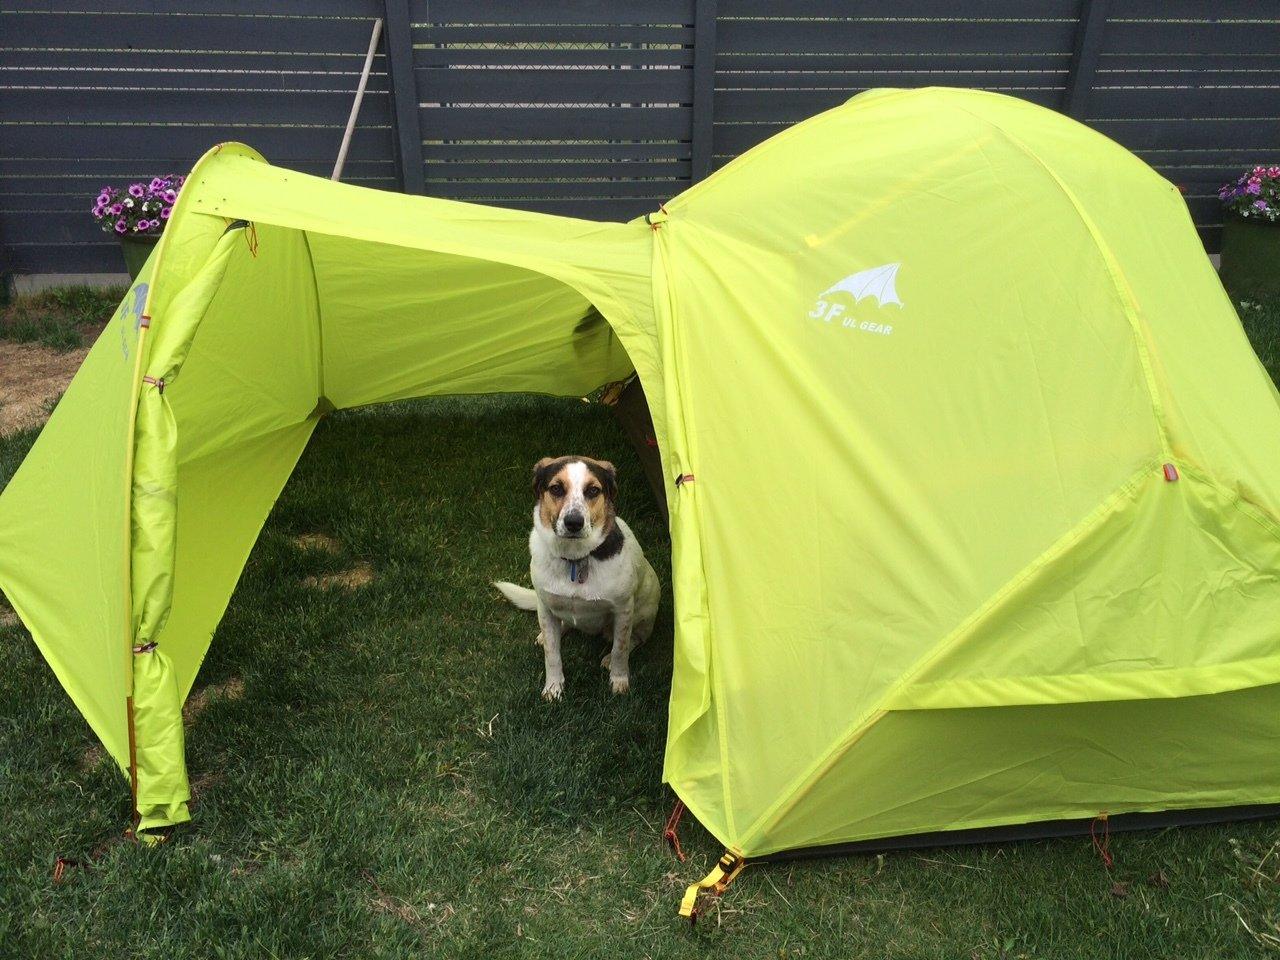 3F UL Gear 2 person, 4 Season 210T Backpacking Tent w/ Gear Shed & Footprint